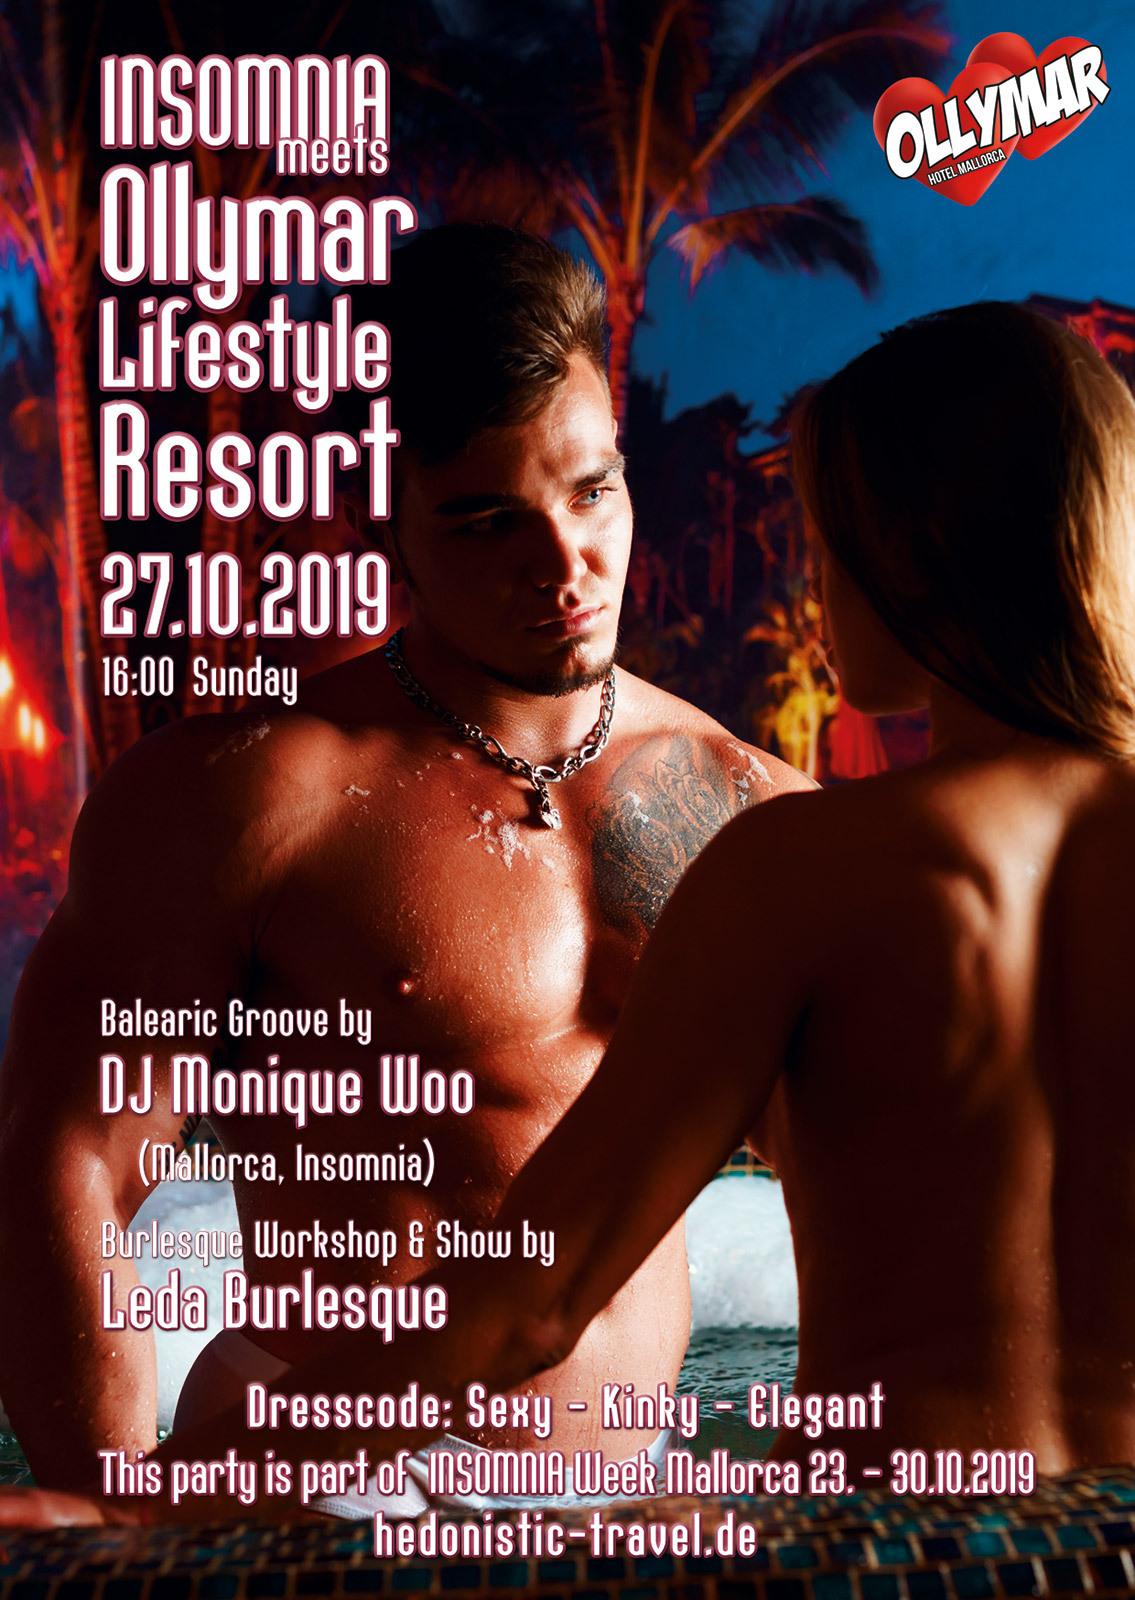 Ollymar Lifestyle Resort